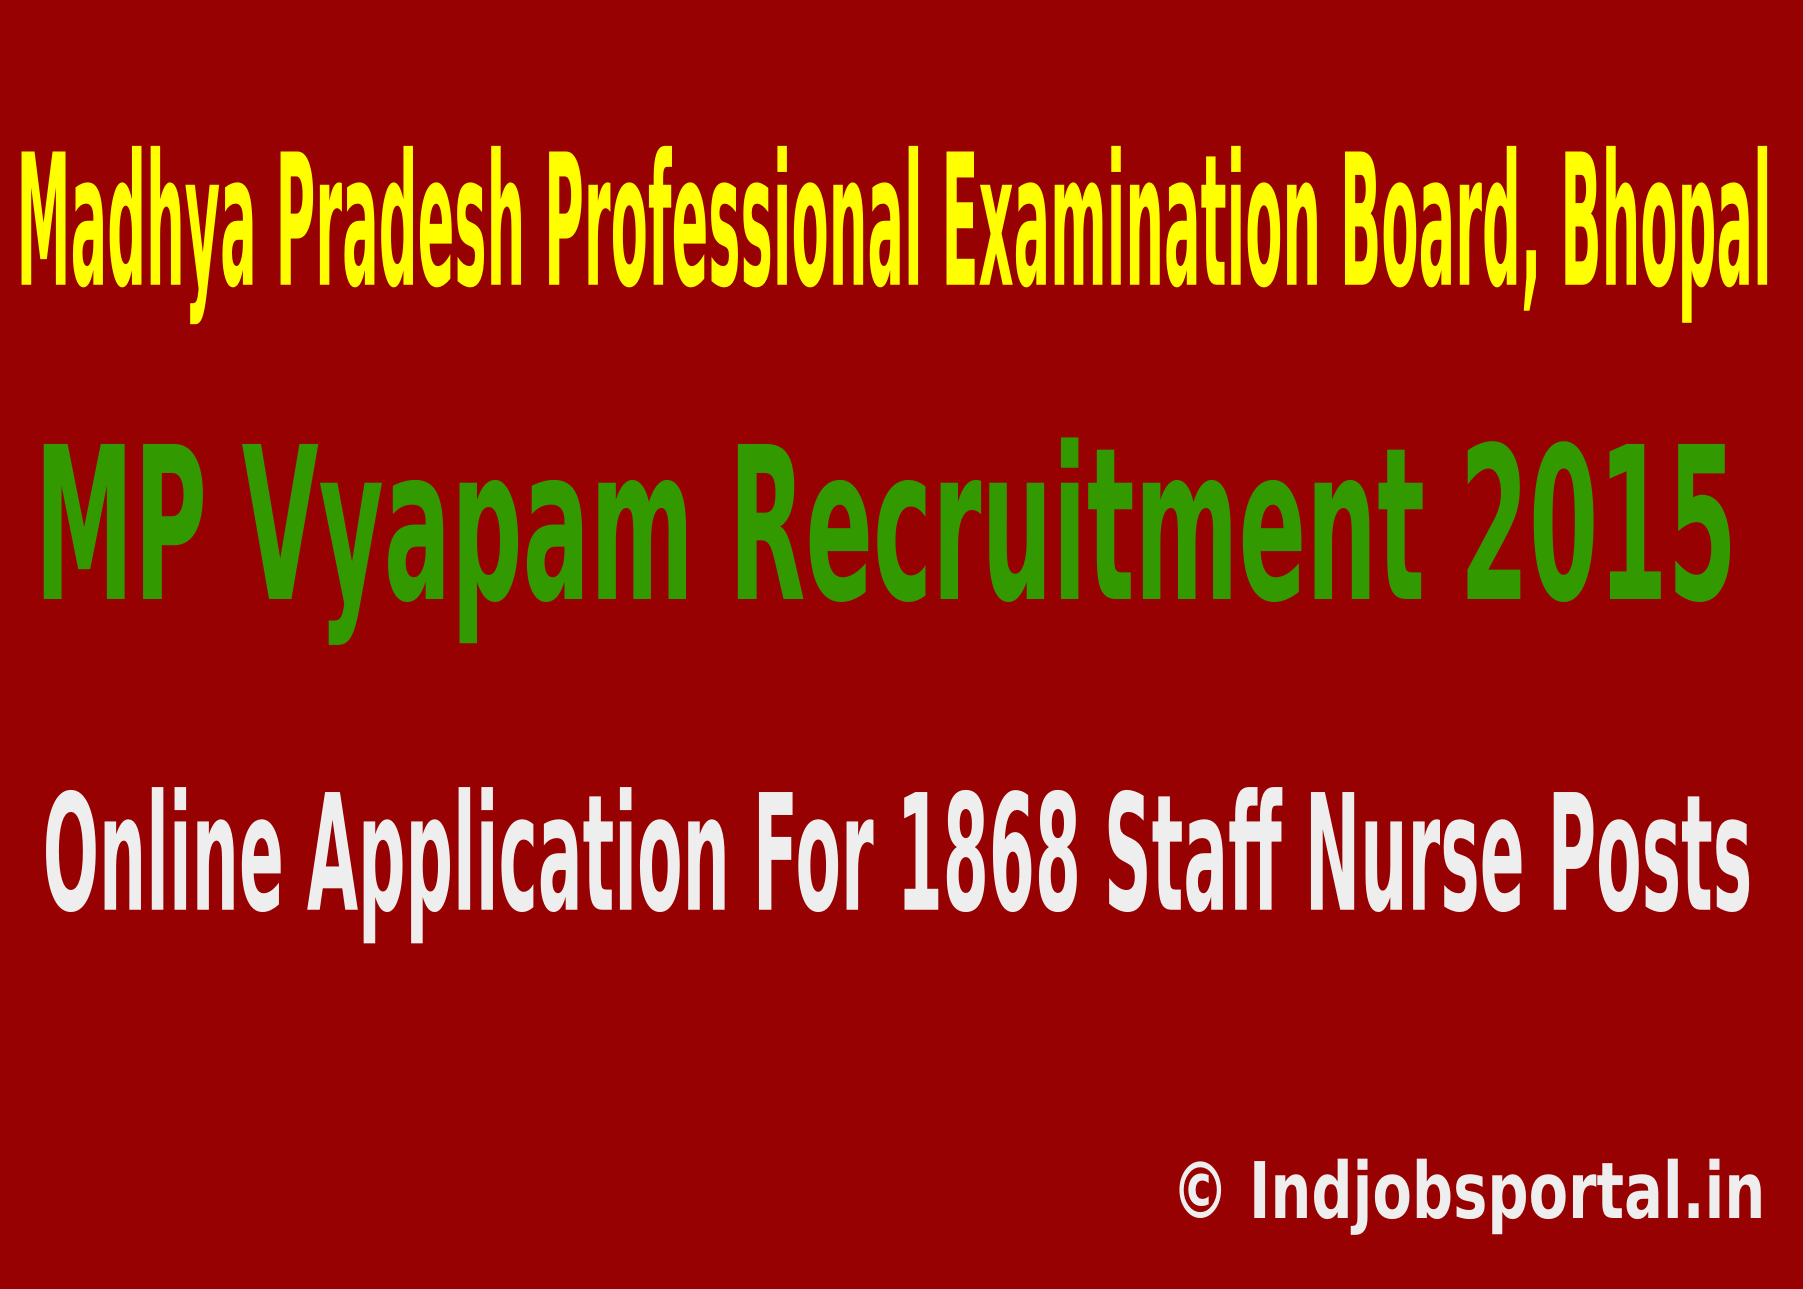 MP Vyapam Recruitment 2015 Online Application For 1868 Staff Nurse Posts